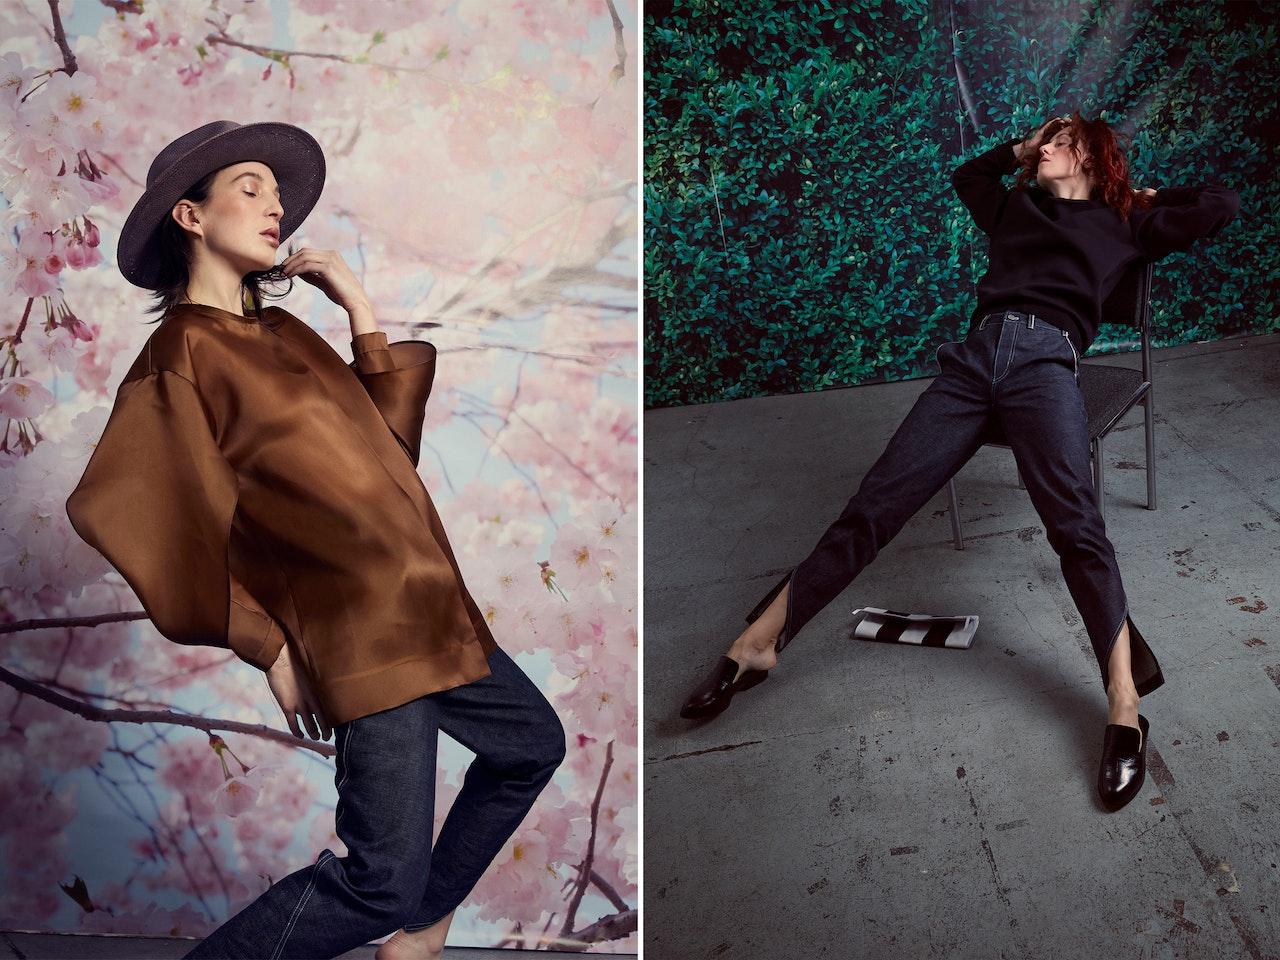 Fashion - Lookbook for Hannes Kettritz - Fashion Designer  / Photography: Maximilian Mouson